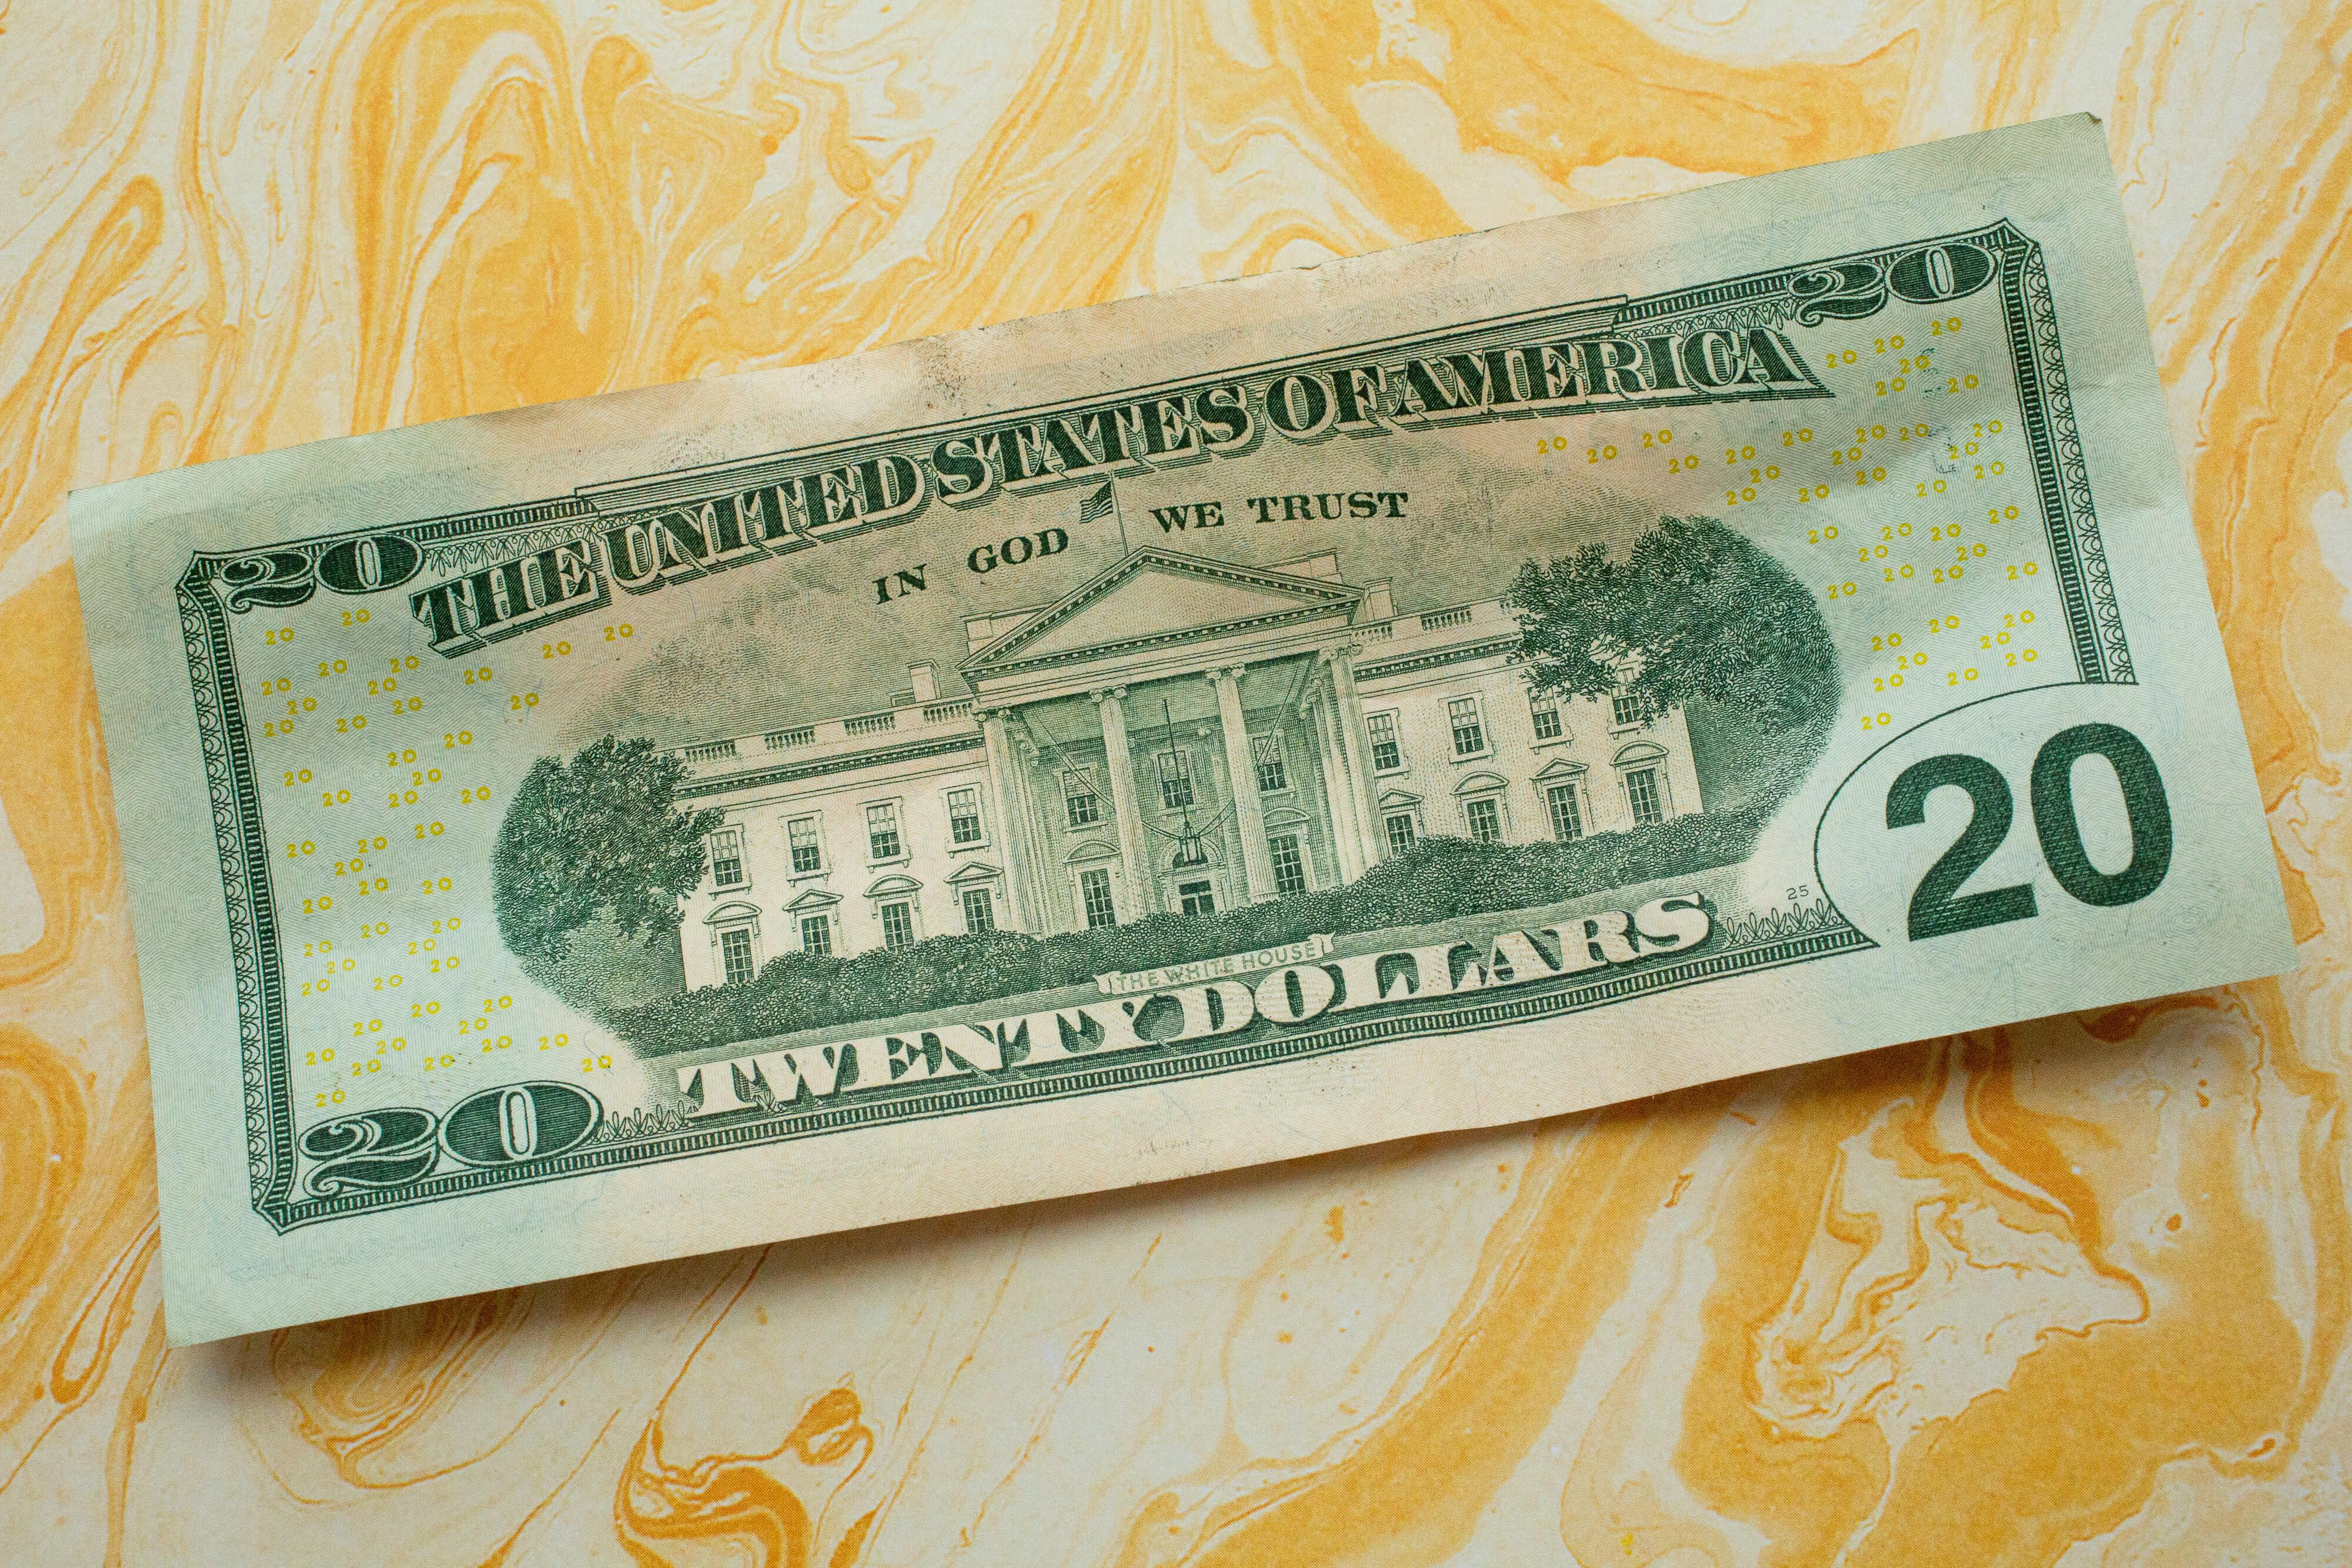 027-cash-stimulus-empty-wallet-economic-crisis-dollar-bill-currency-2020